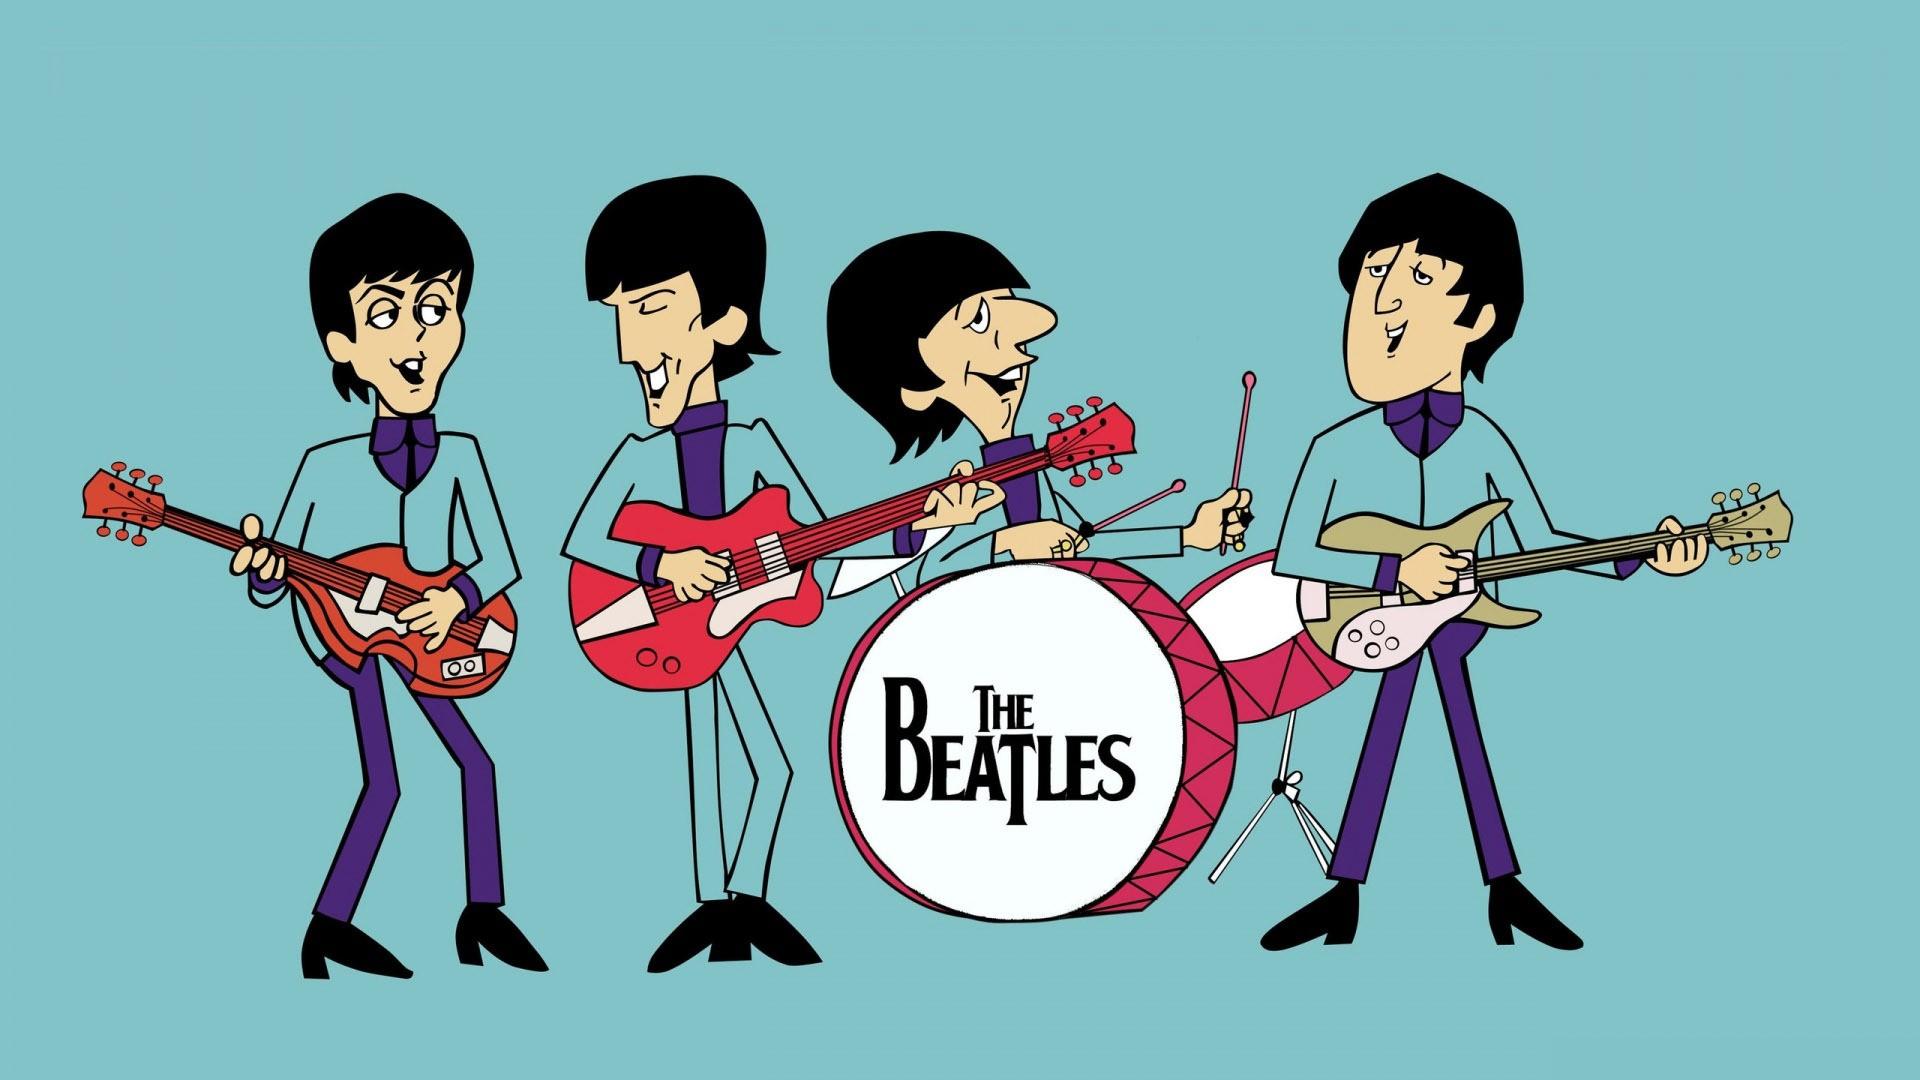 Musician Singer The Beatles Cartoon Blue Background Guitar Drums John Lennon Paul Mccartney George H Wallpaper Resolution 1920x1080 Id 586976 Wallha Com